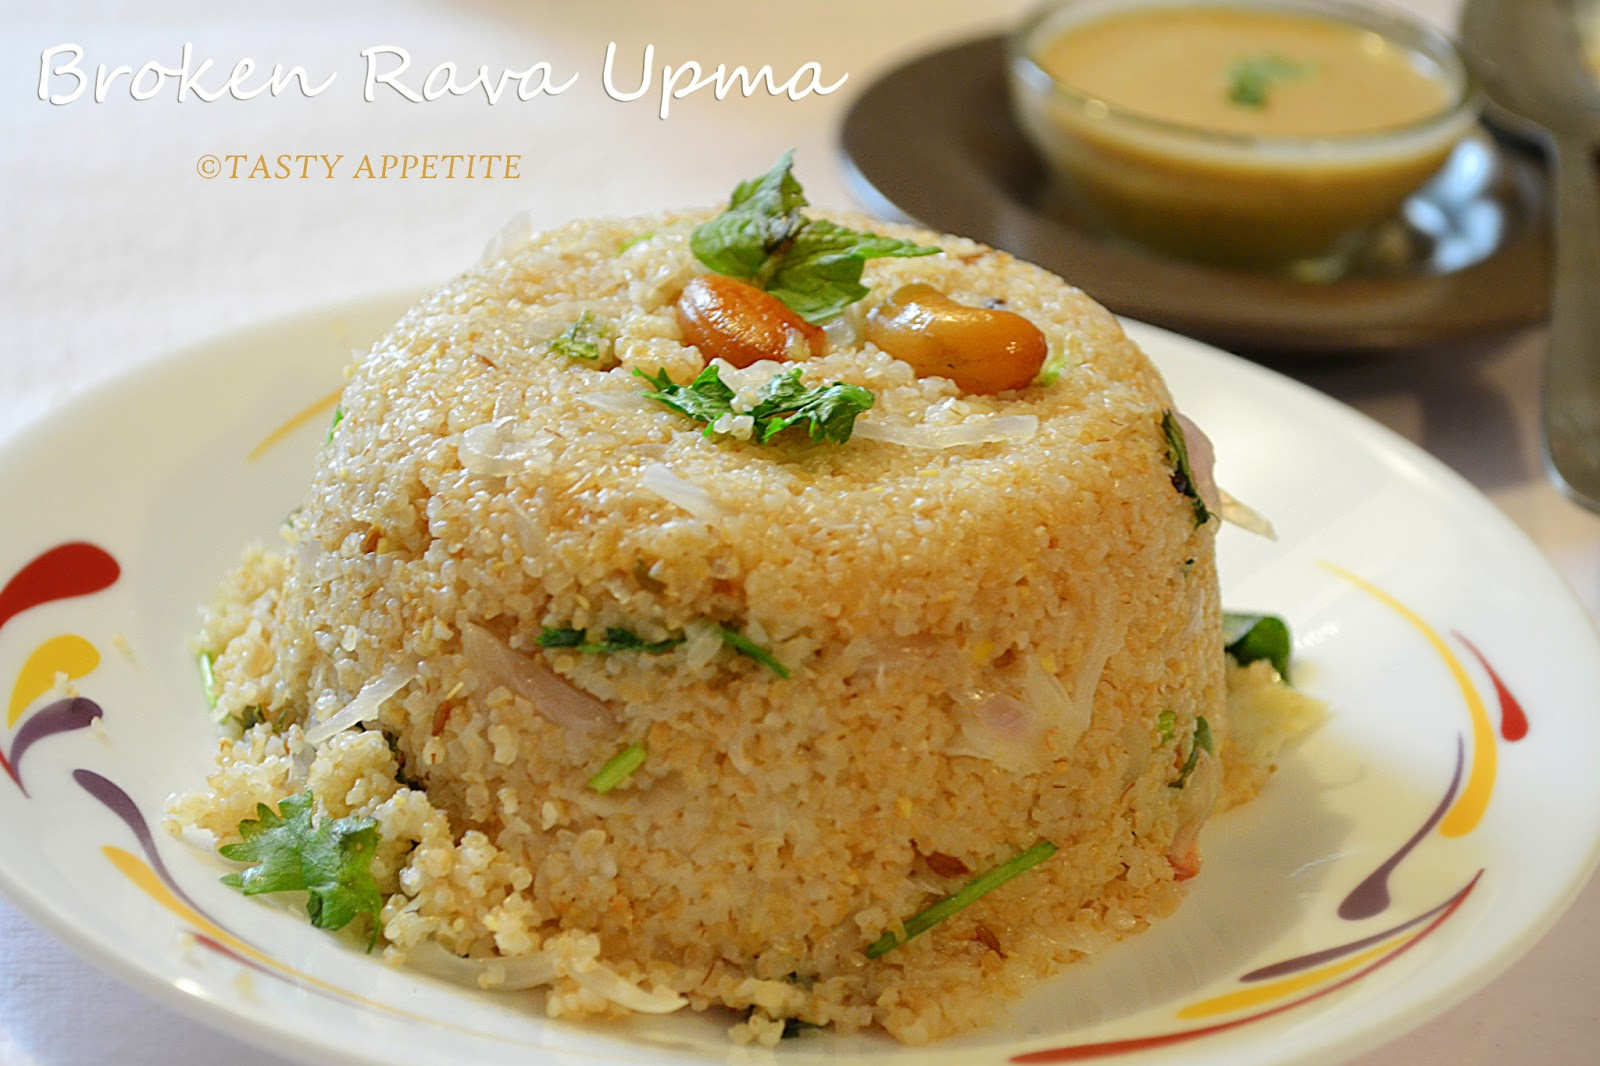 How to make Wheat Rava Upma / Godhuma Rava Upma / Broken